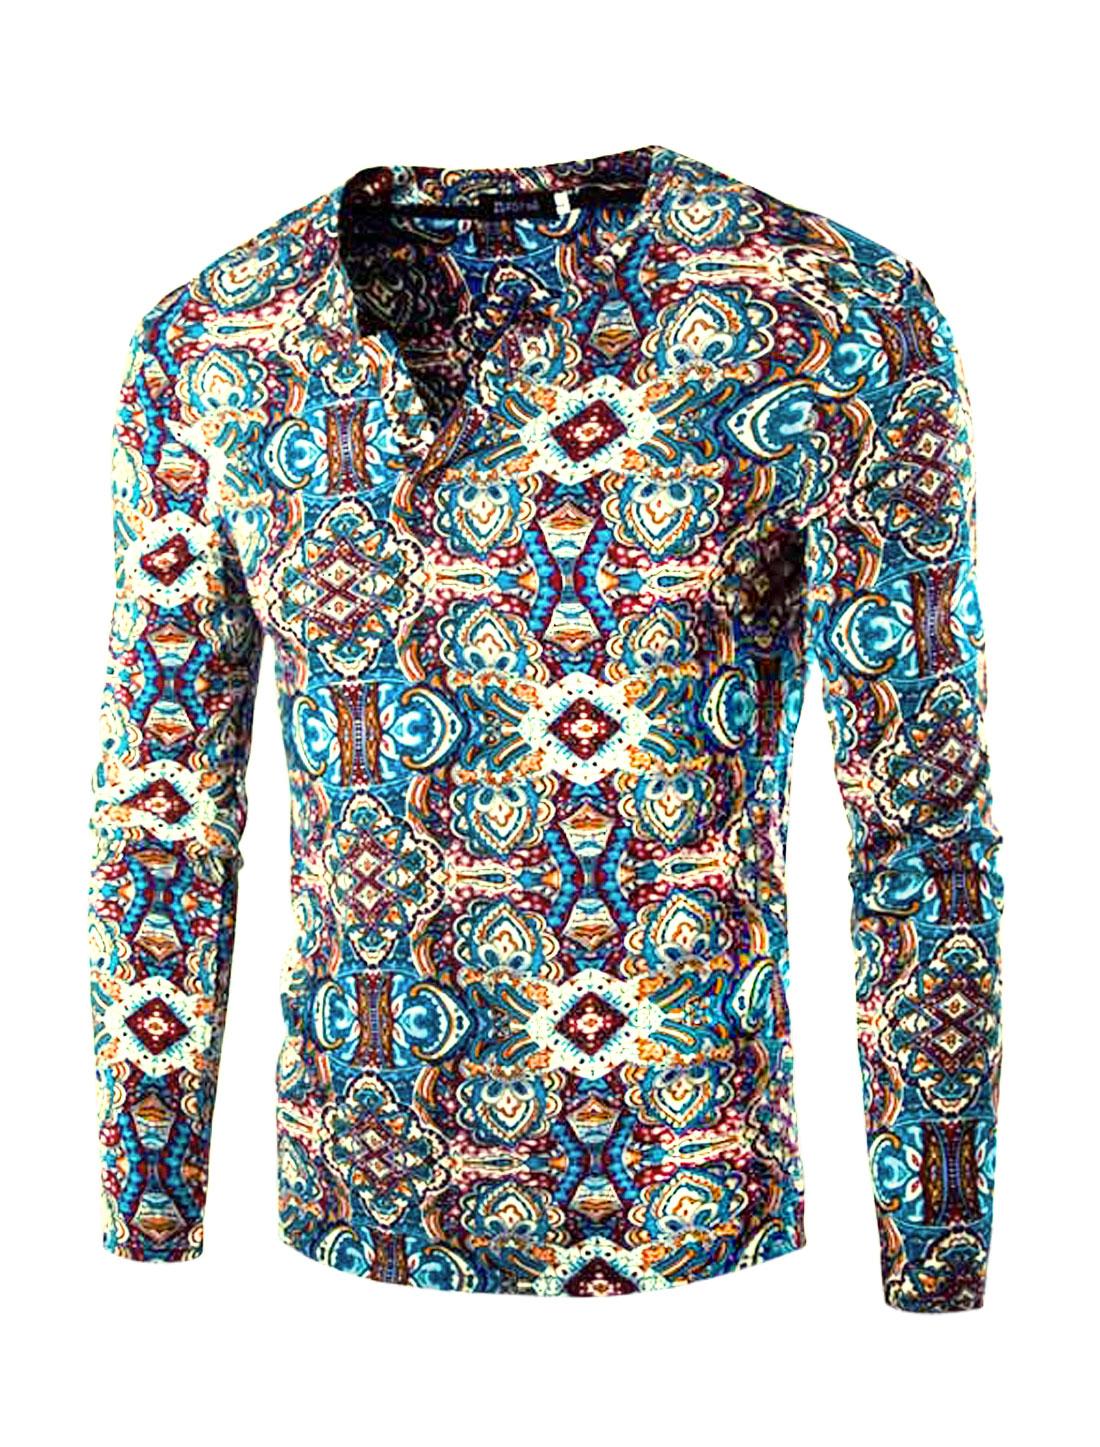 Men Split Neck Long Sleeves Slim Fit Floral Prints Tee Shirt Light Blue S